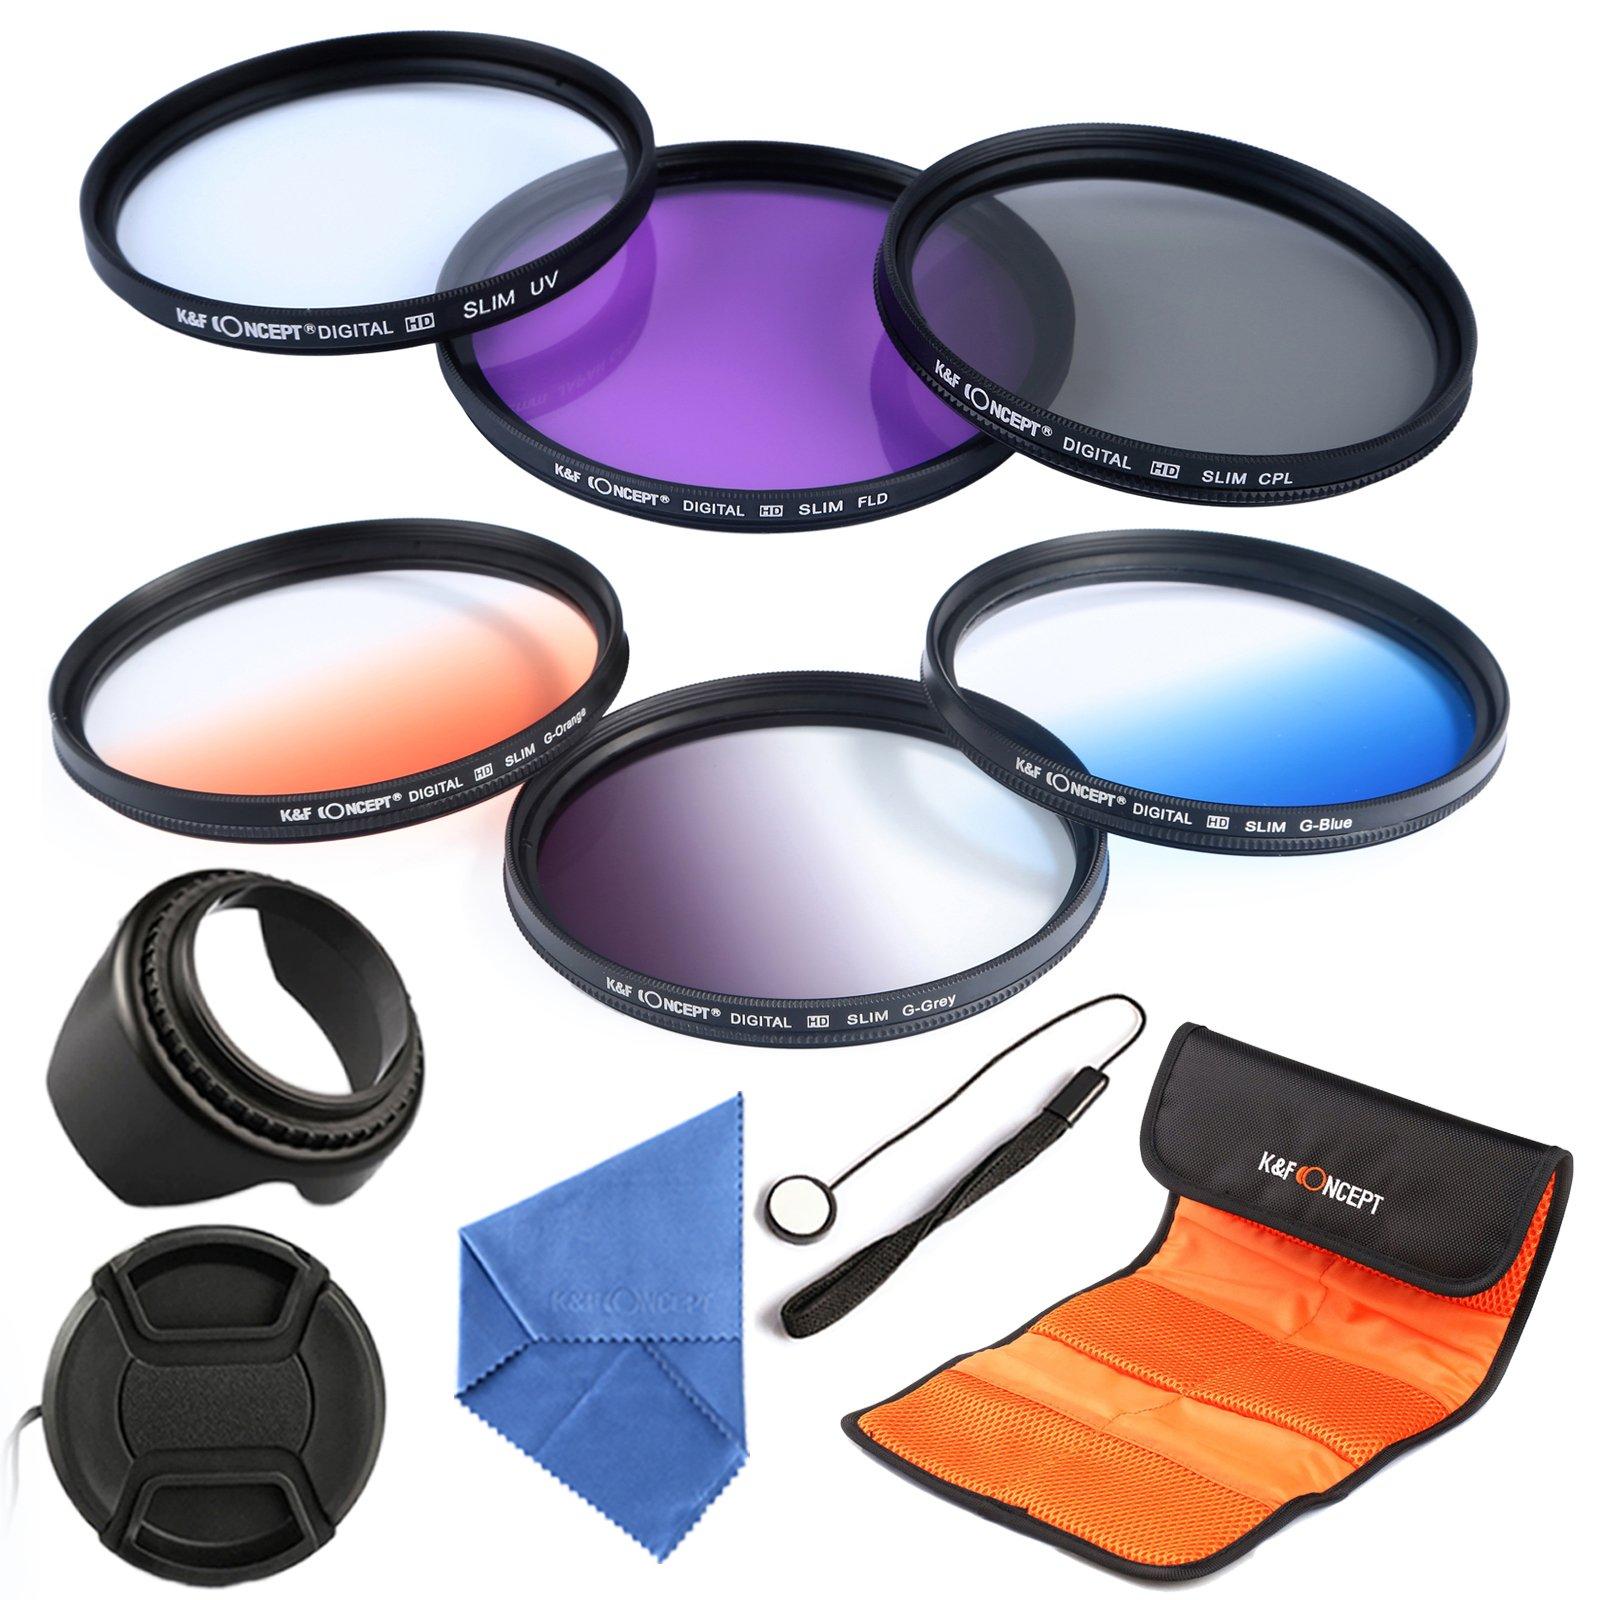 K&F Concept 55mm 6pcs Lens Accessory Filter Kit UV Protector Circular Polarizing Filter for Sony A37 A55 A57 A65 A77 A100 DSLR Cameras - Includes Filter Kit( UV+CPL+FLD,Graduated Color Blue,Orange,Gray) + Microfiber Lens Cleaning Cloth + Petal Lens Hood +